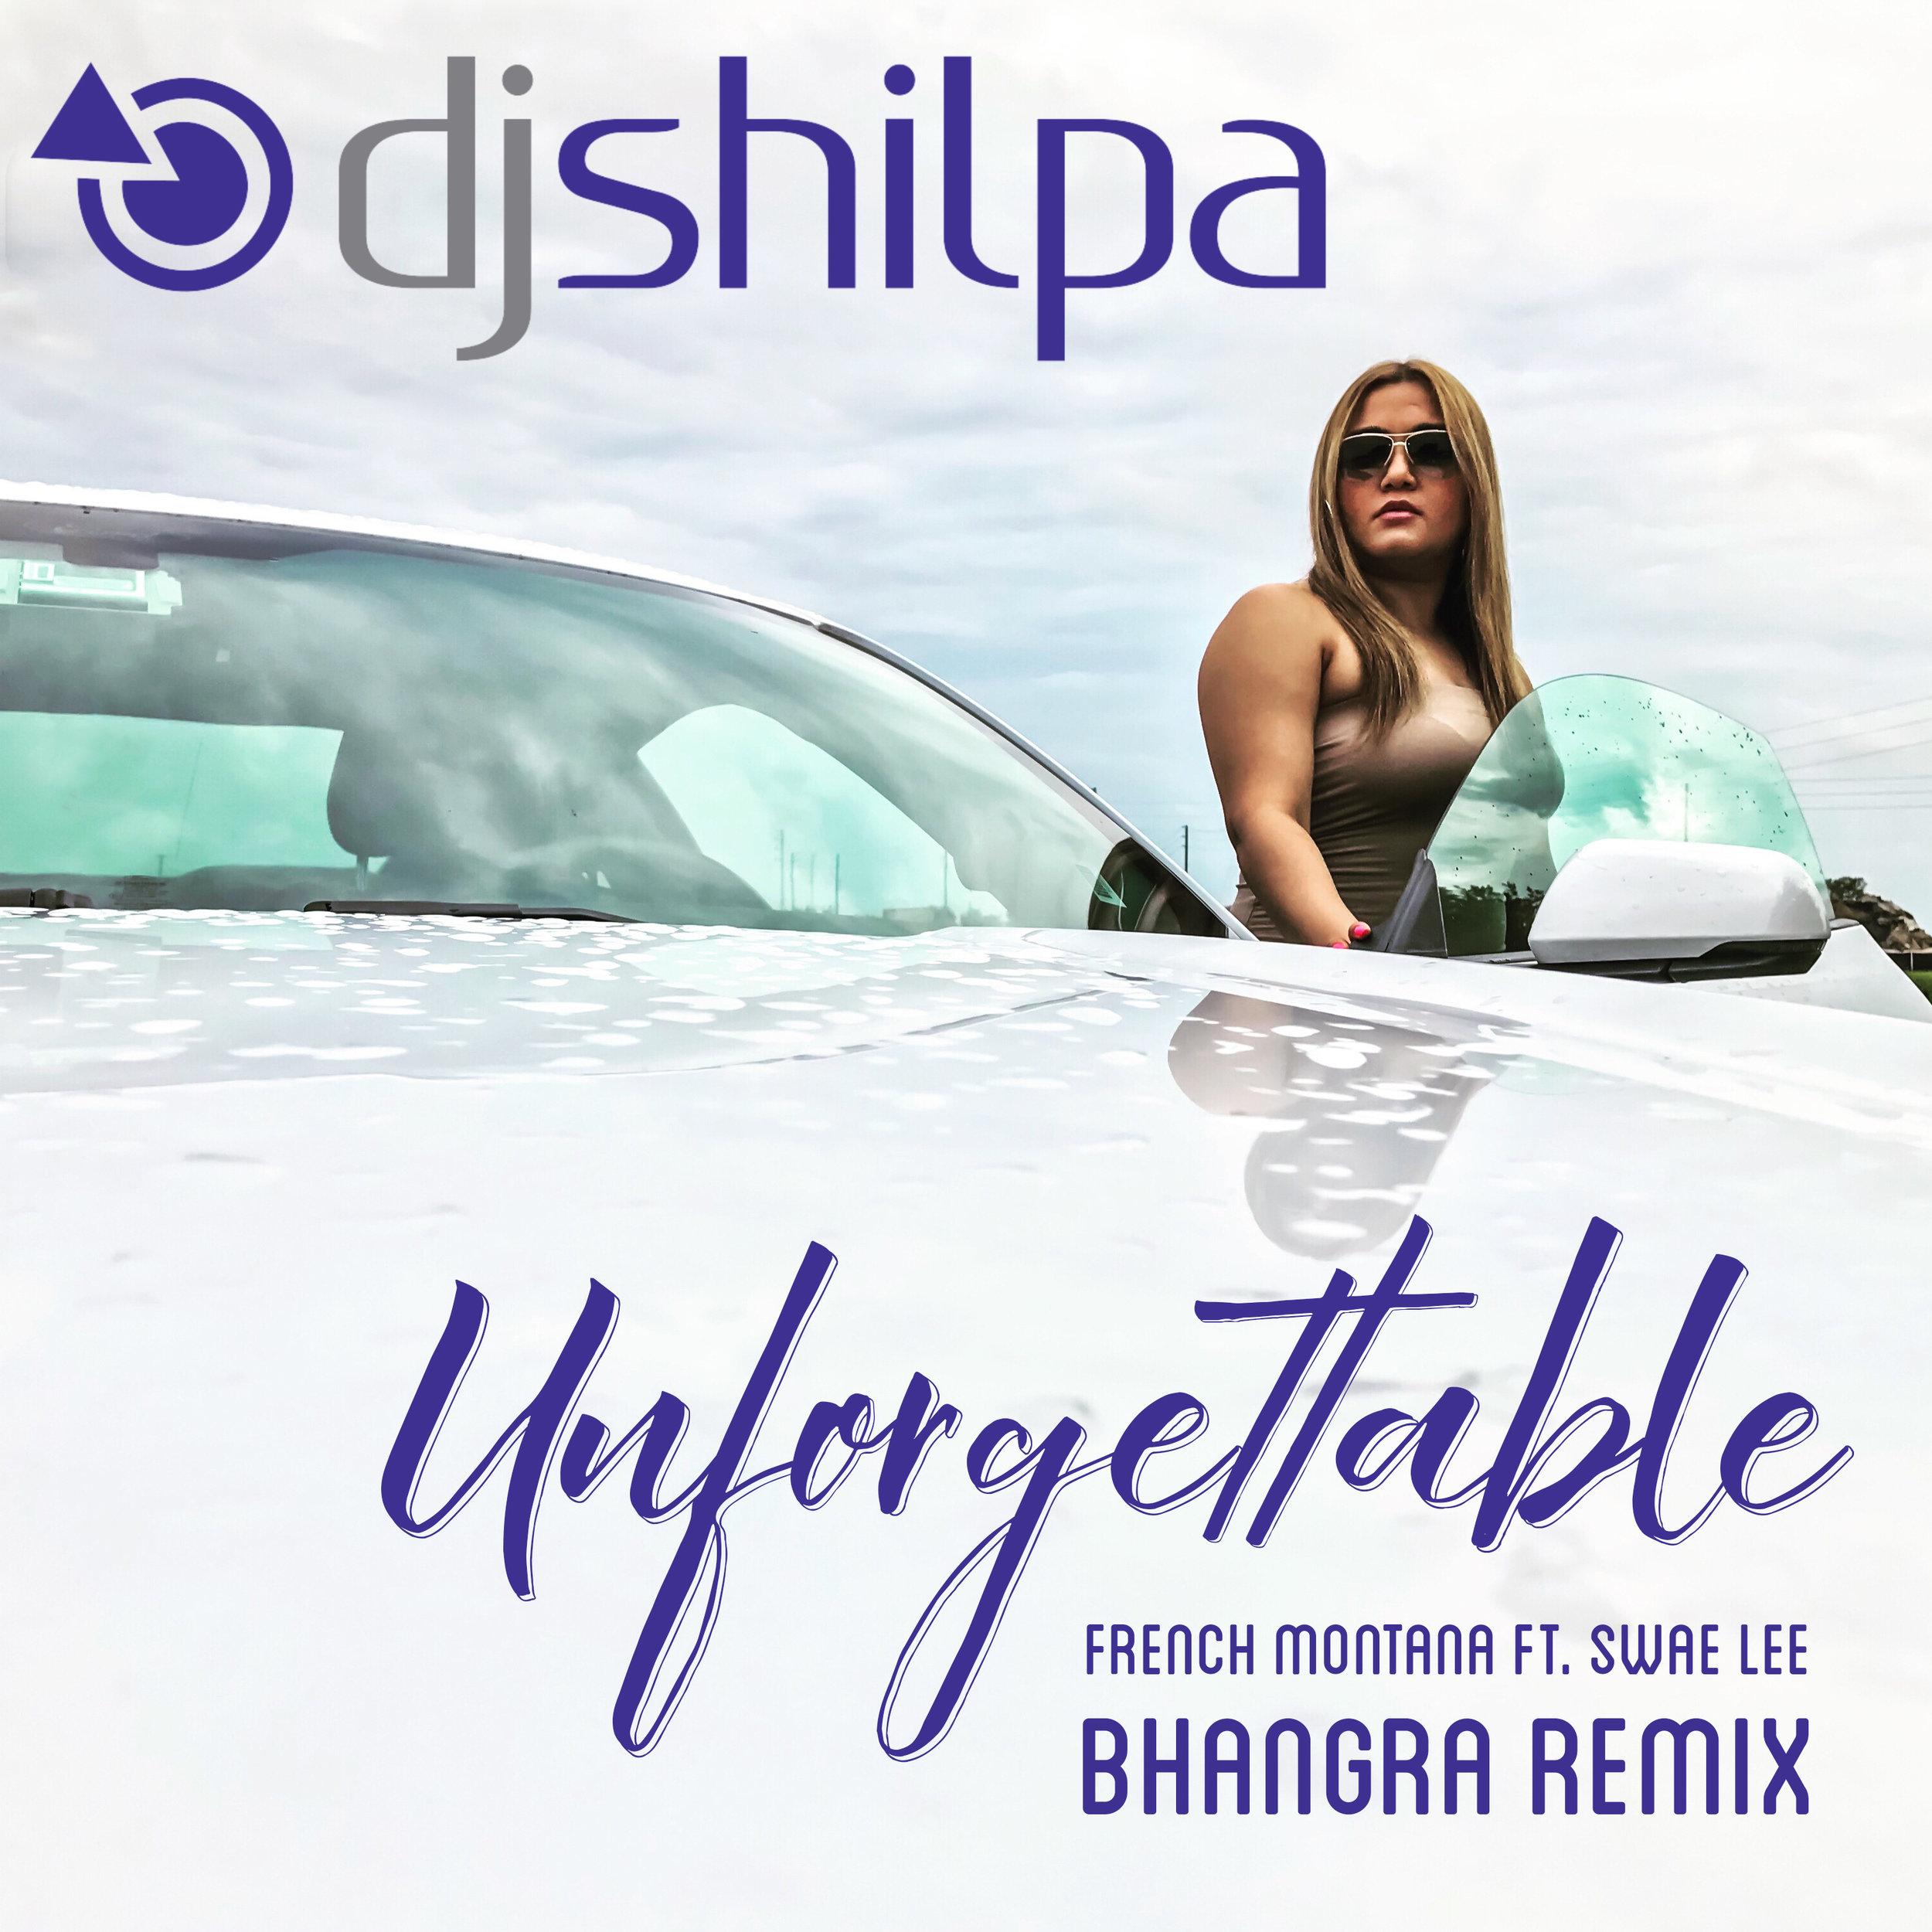 Unforgettable, French Montana Ft. Swae Lee, DJ Shilpa Bhangra Remix